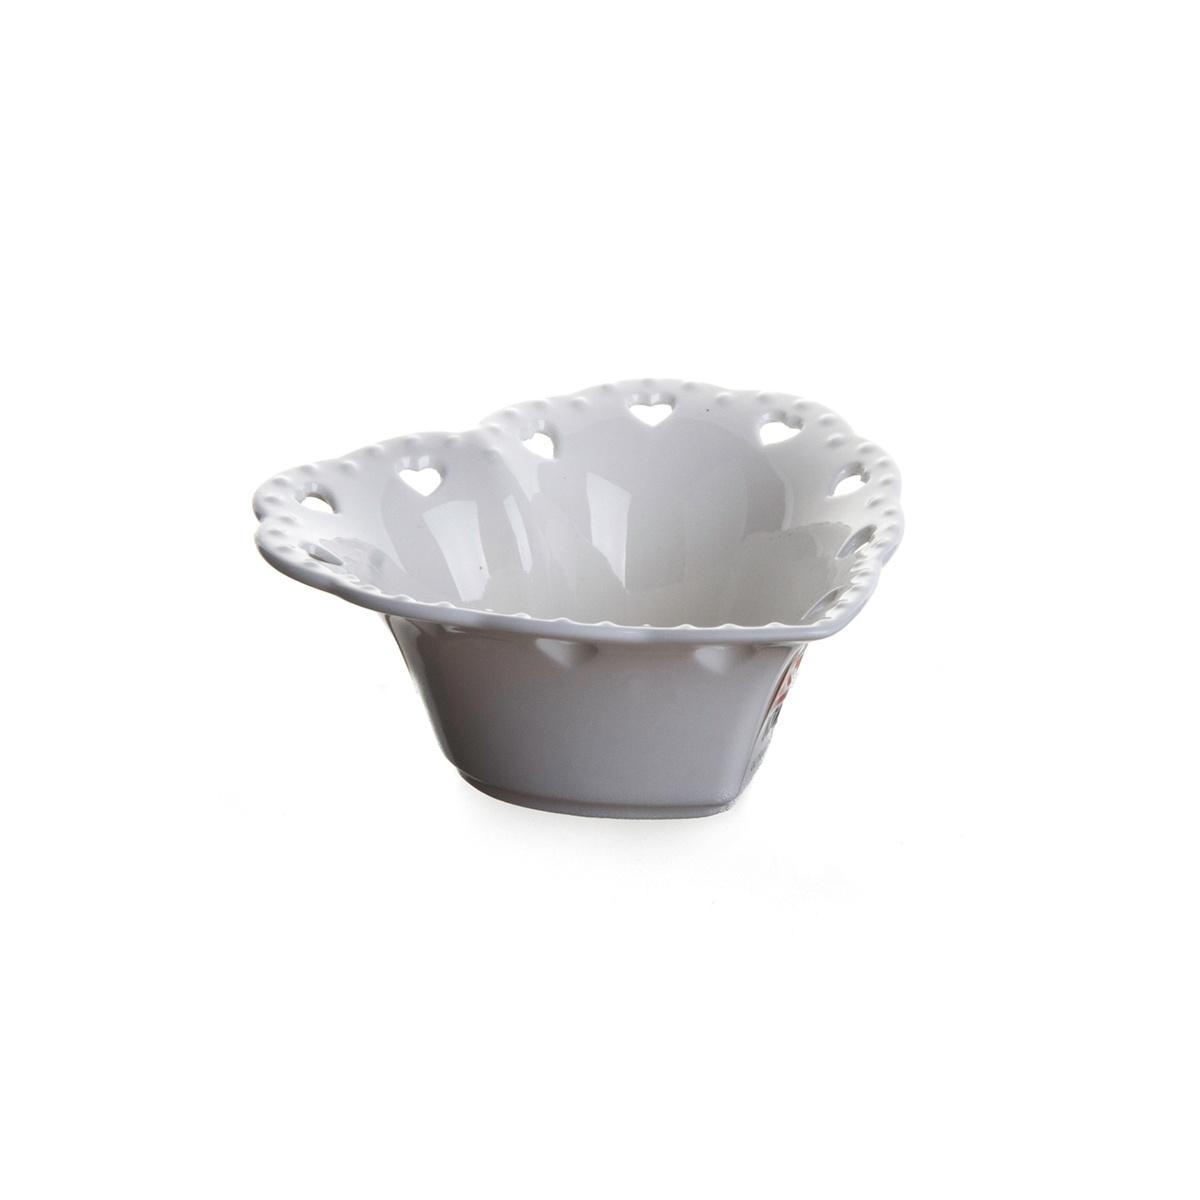 Standart Ultraform Porselen Delikli Kalp Kase 10 Cm